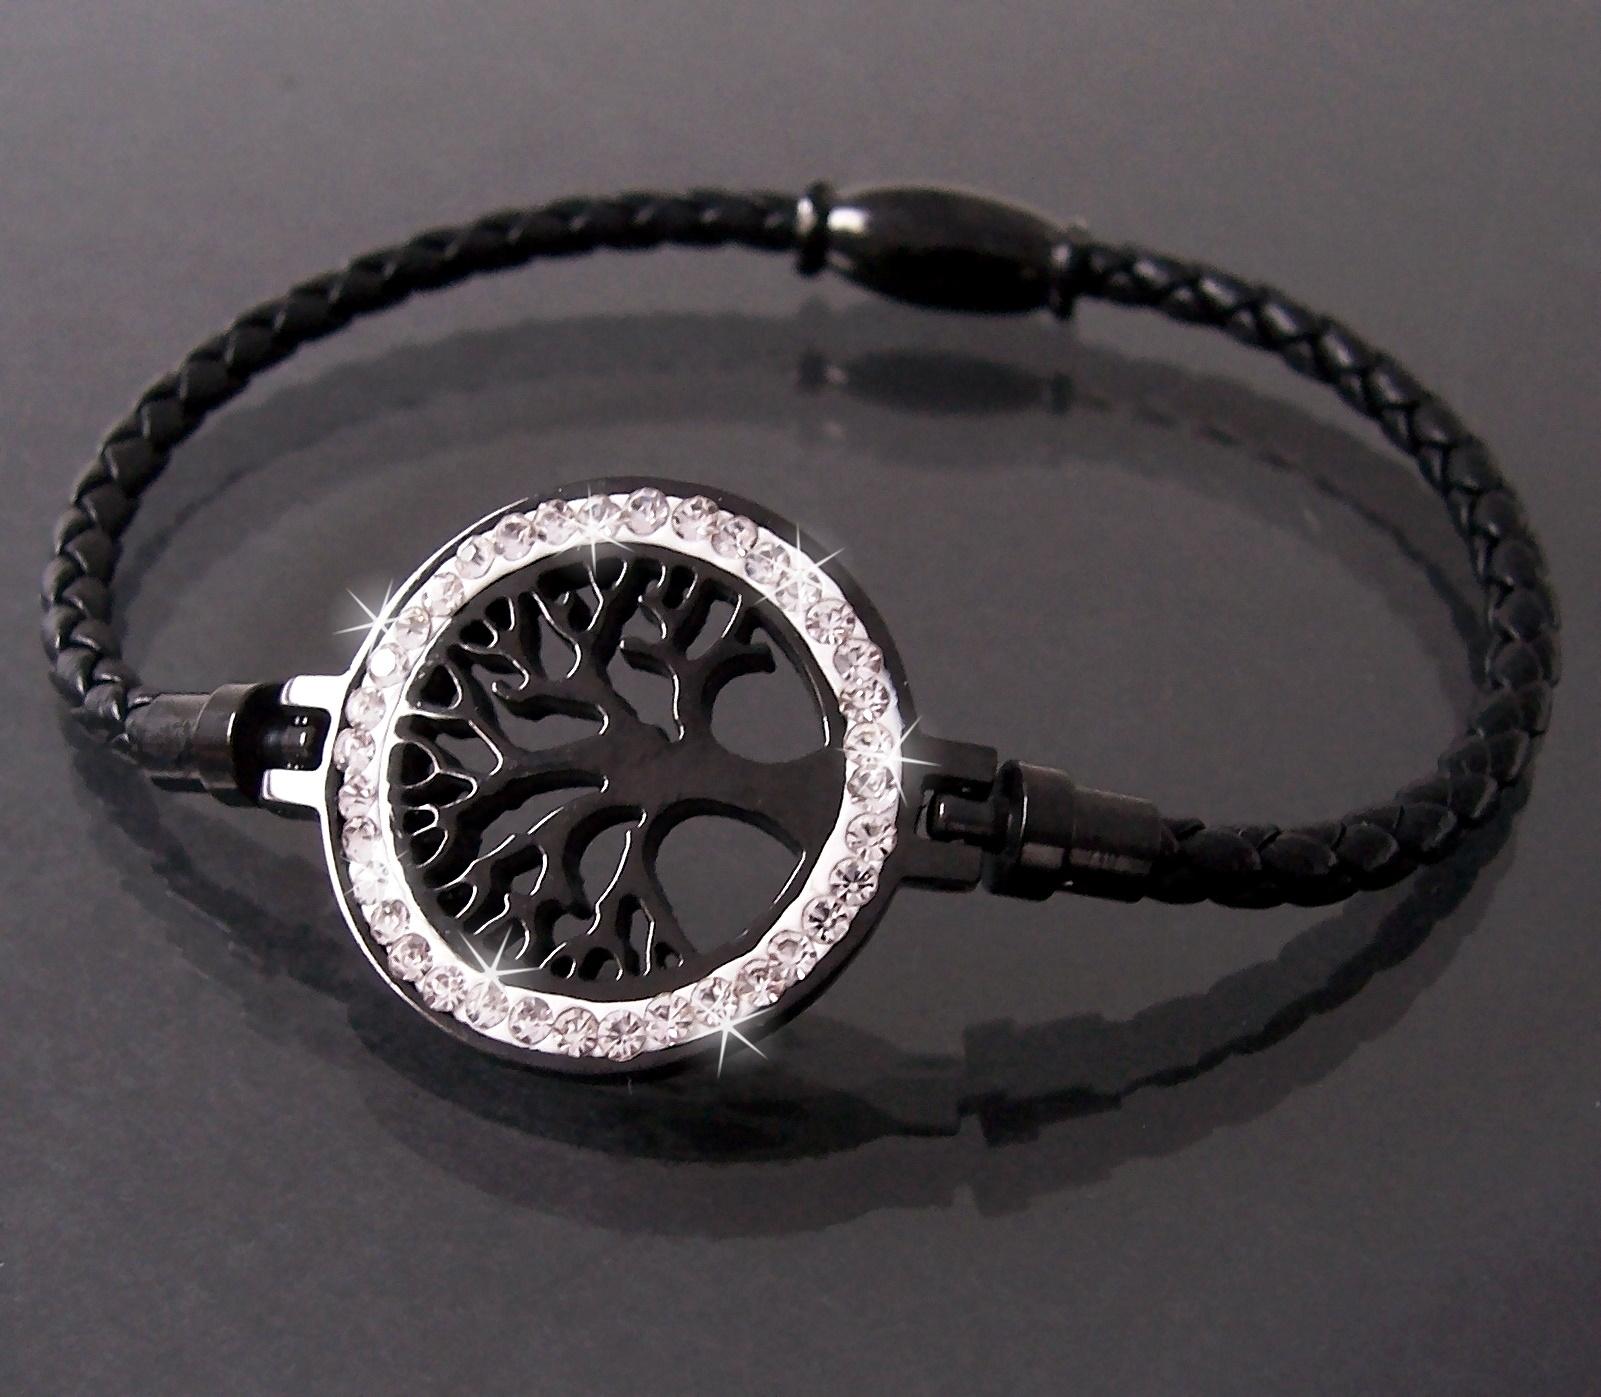 Armband Leder schwarz Edelstahl Lebensbaum Strass Magnet Damen A77745